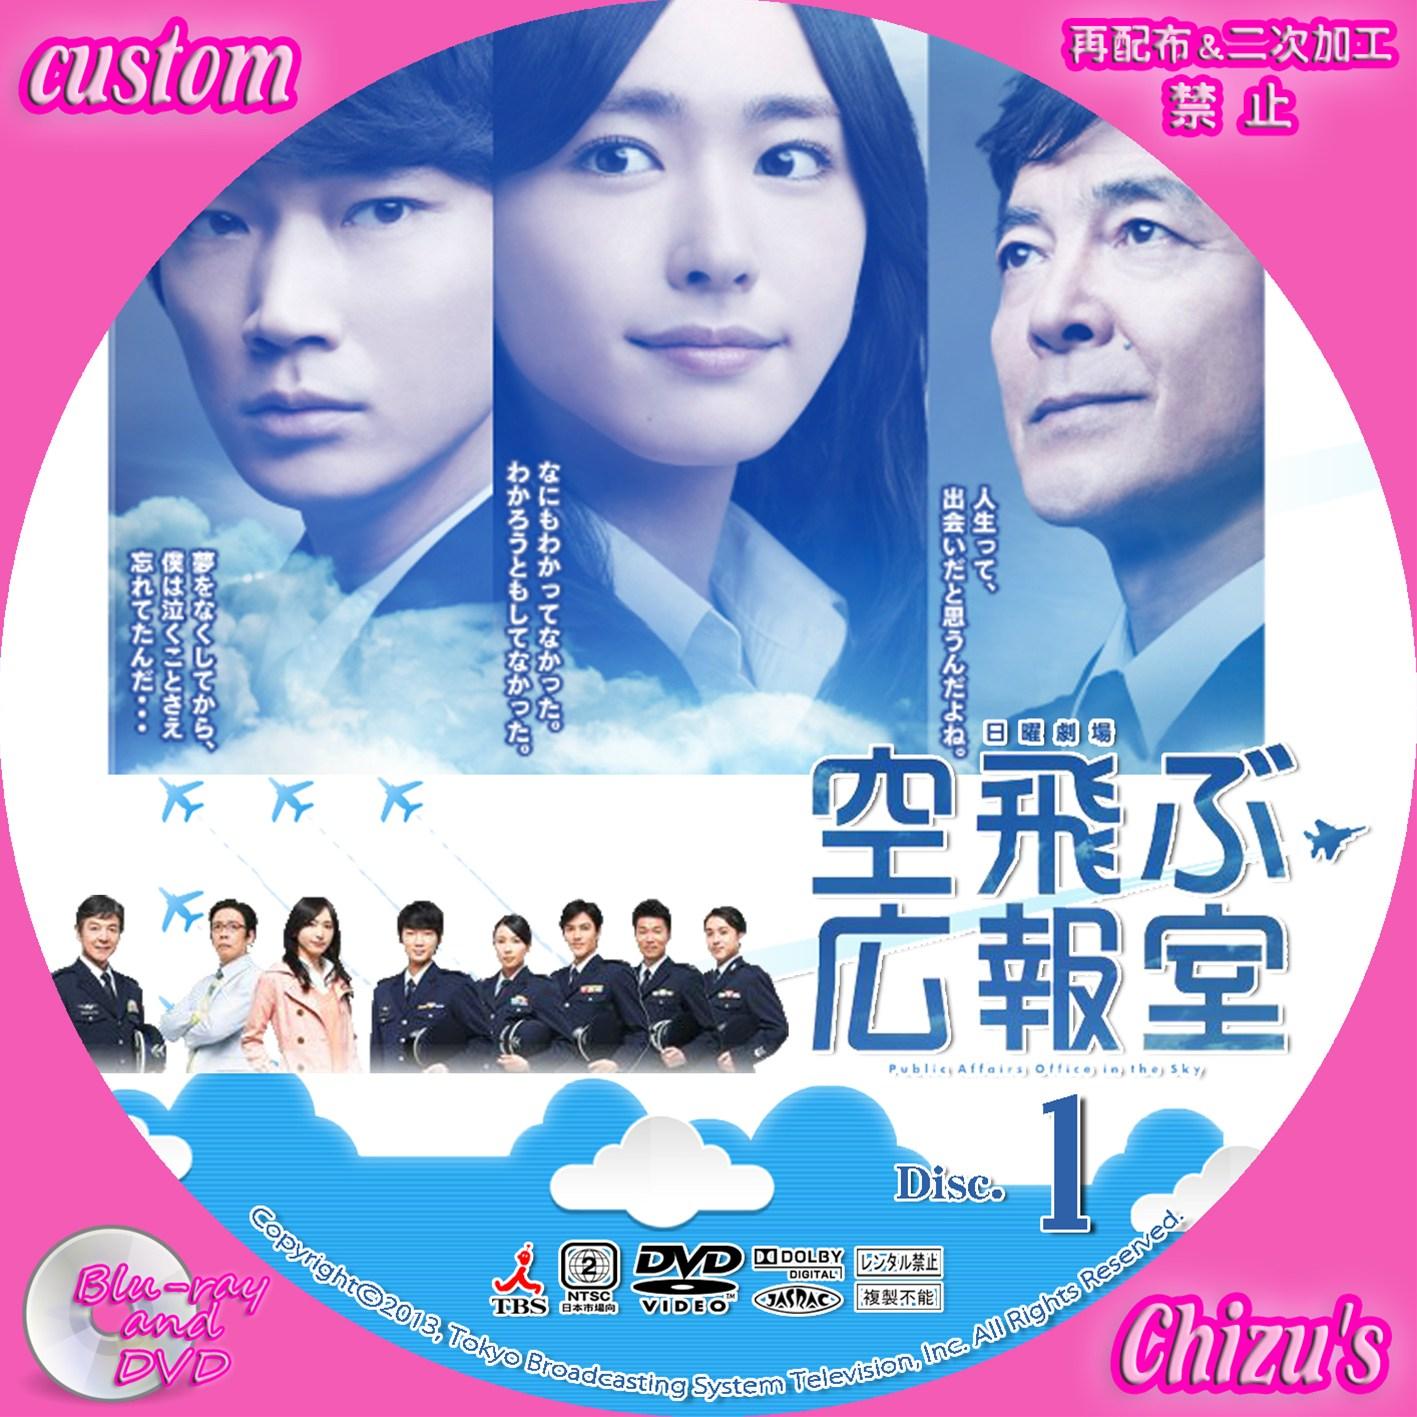 Custom Label Of Blu Ray And Dvd Fc2 Blog パスワード認証